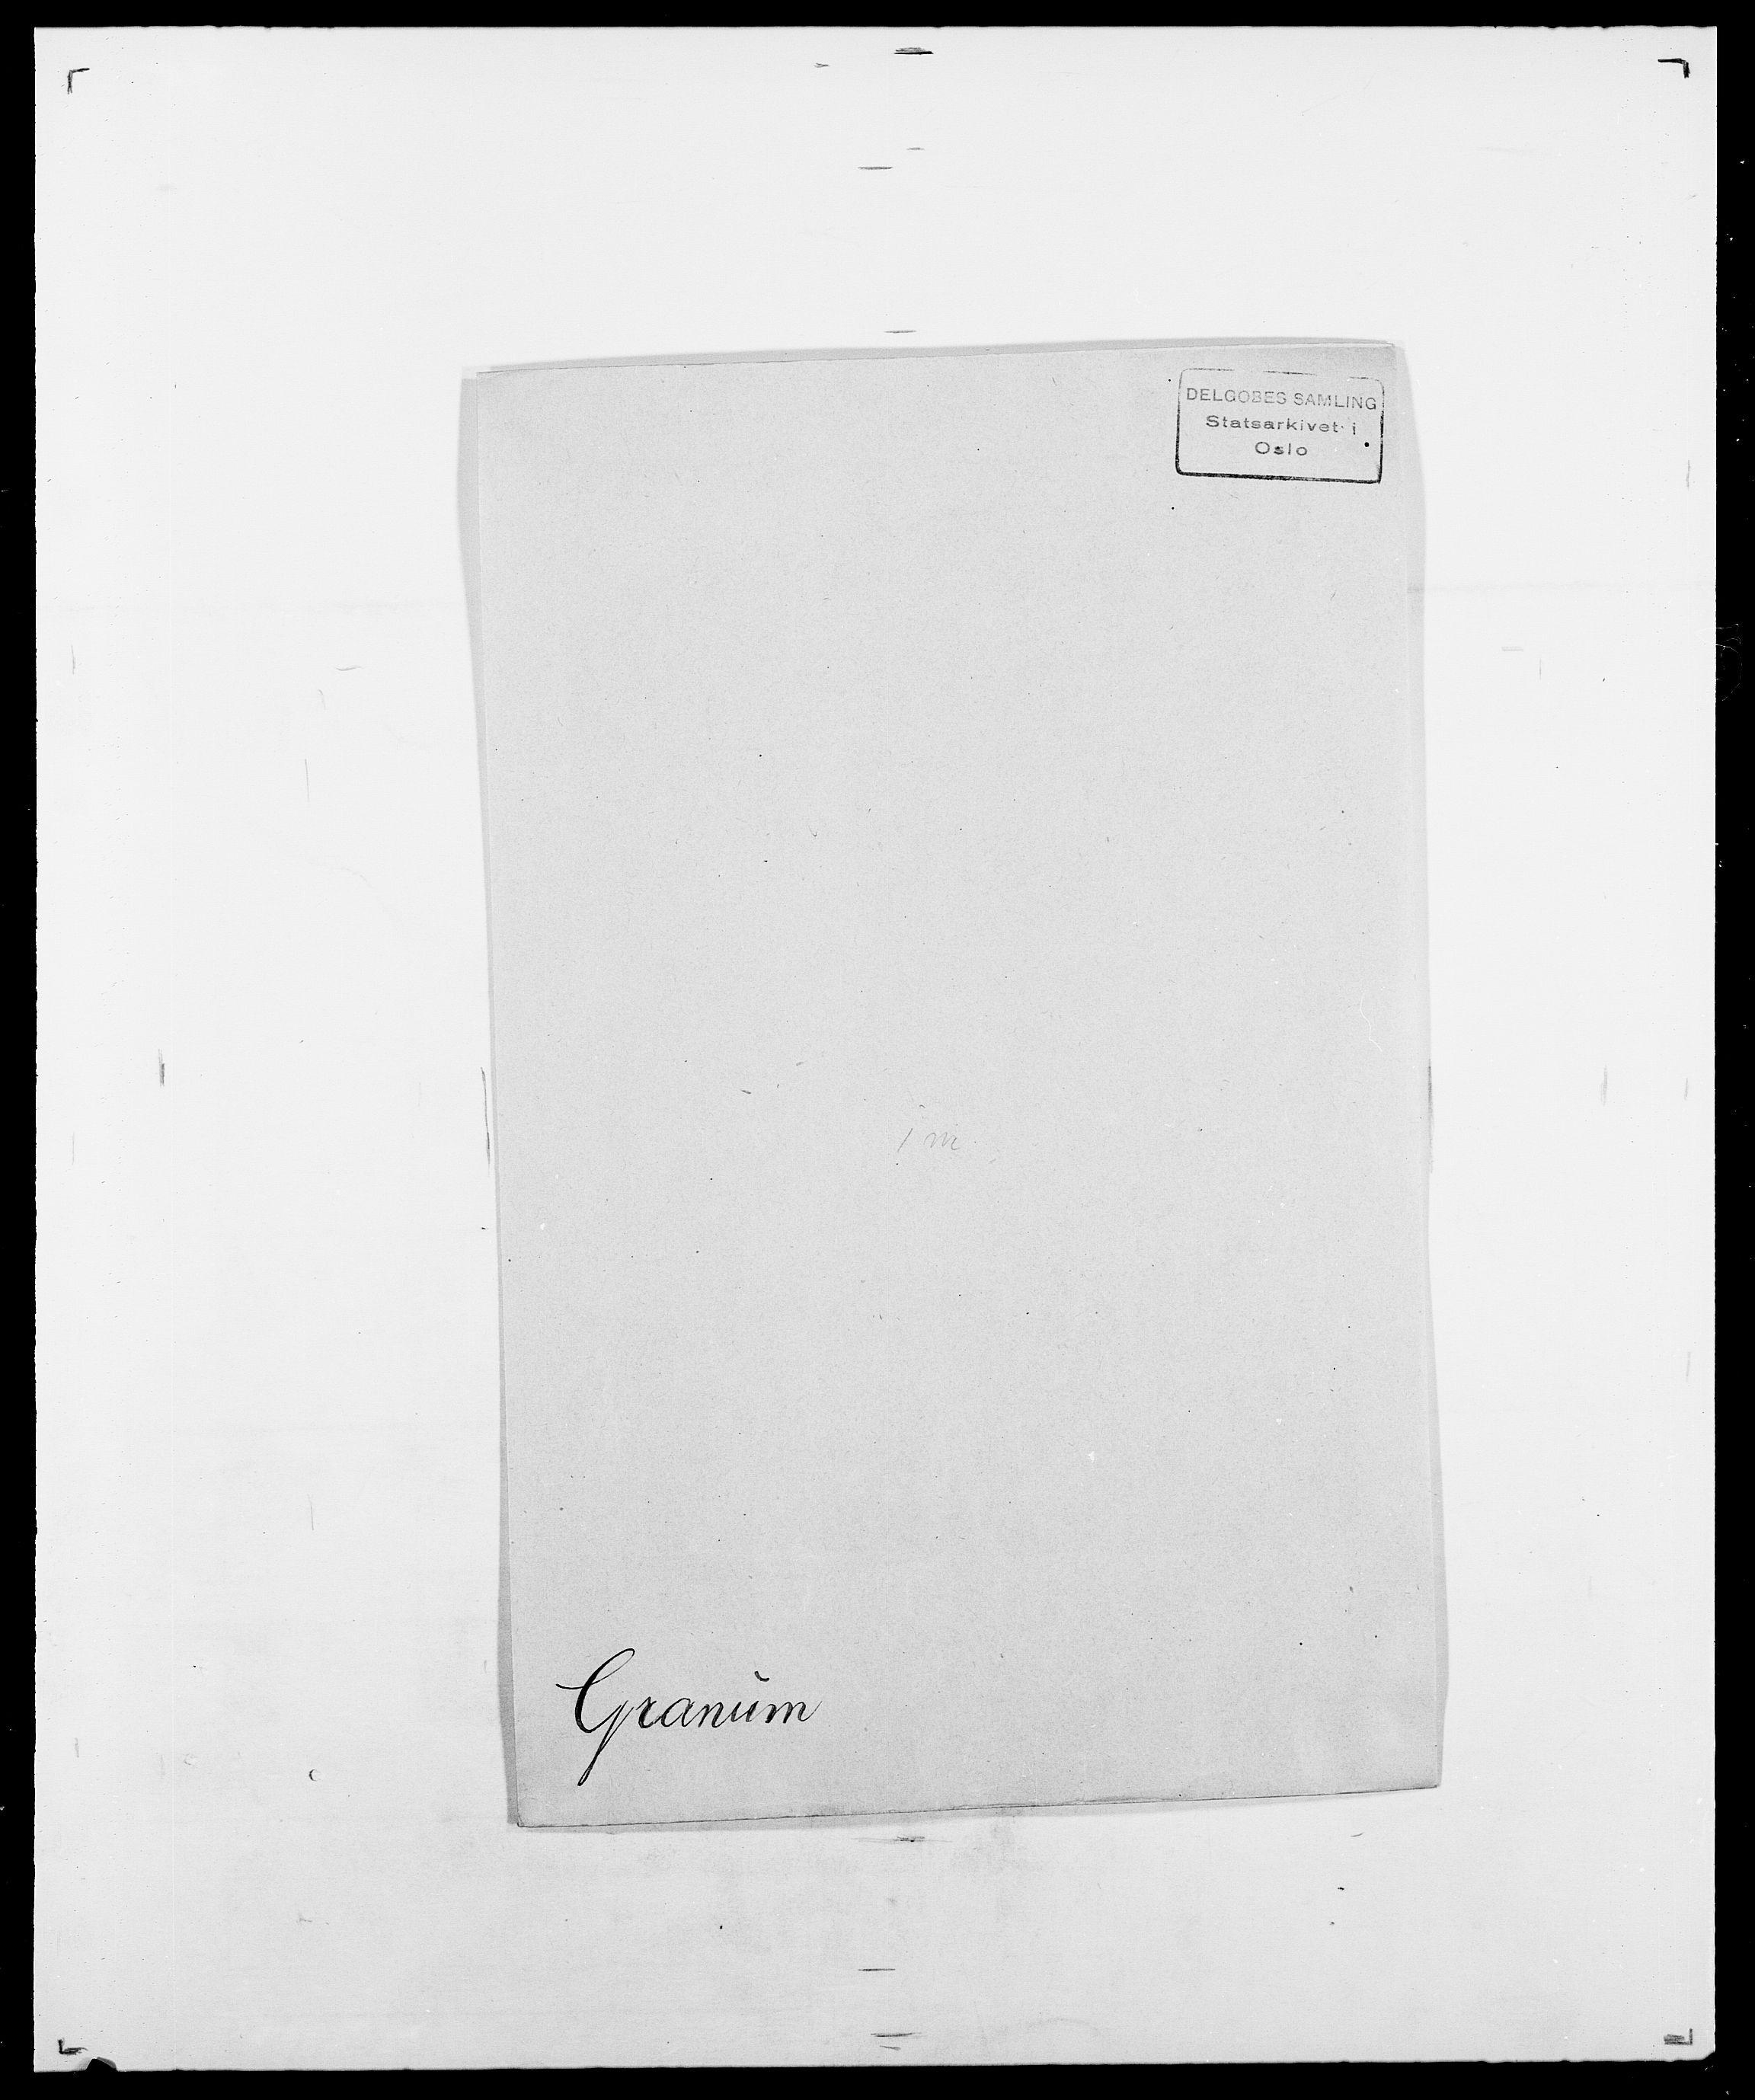 SAO, Delgobe, Charles Antoine - samling, D/Da/L0014: Giebdhausen - Grip, s. 551